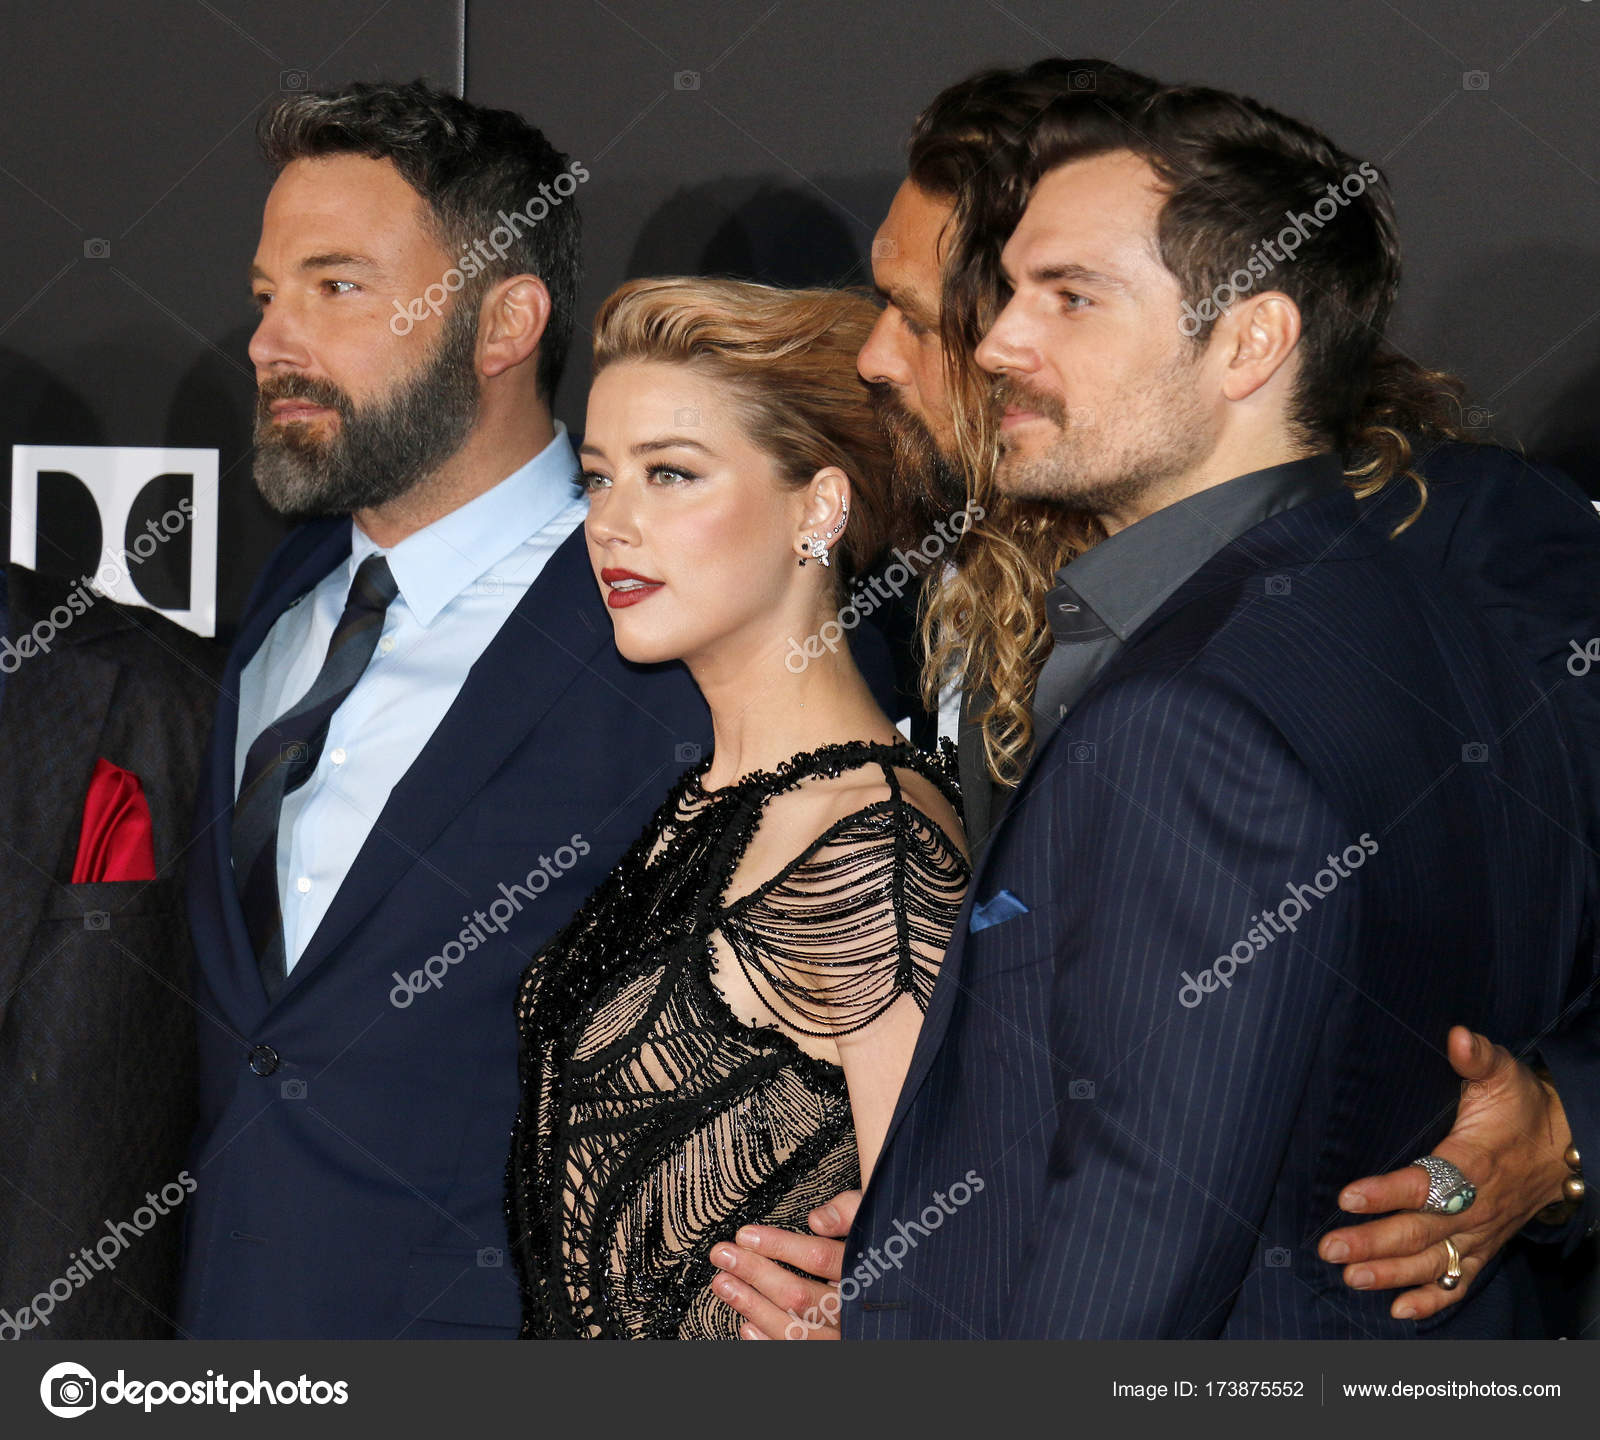 Amber Heard And Jason Momoa Photos Photos: Actors Ben Affleck, Amber Heard, Henry Cavill And Jason